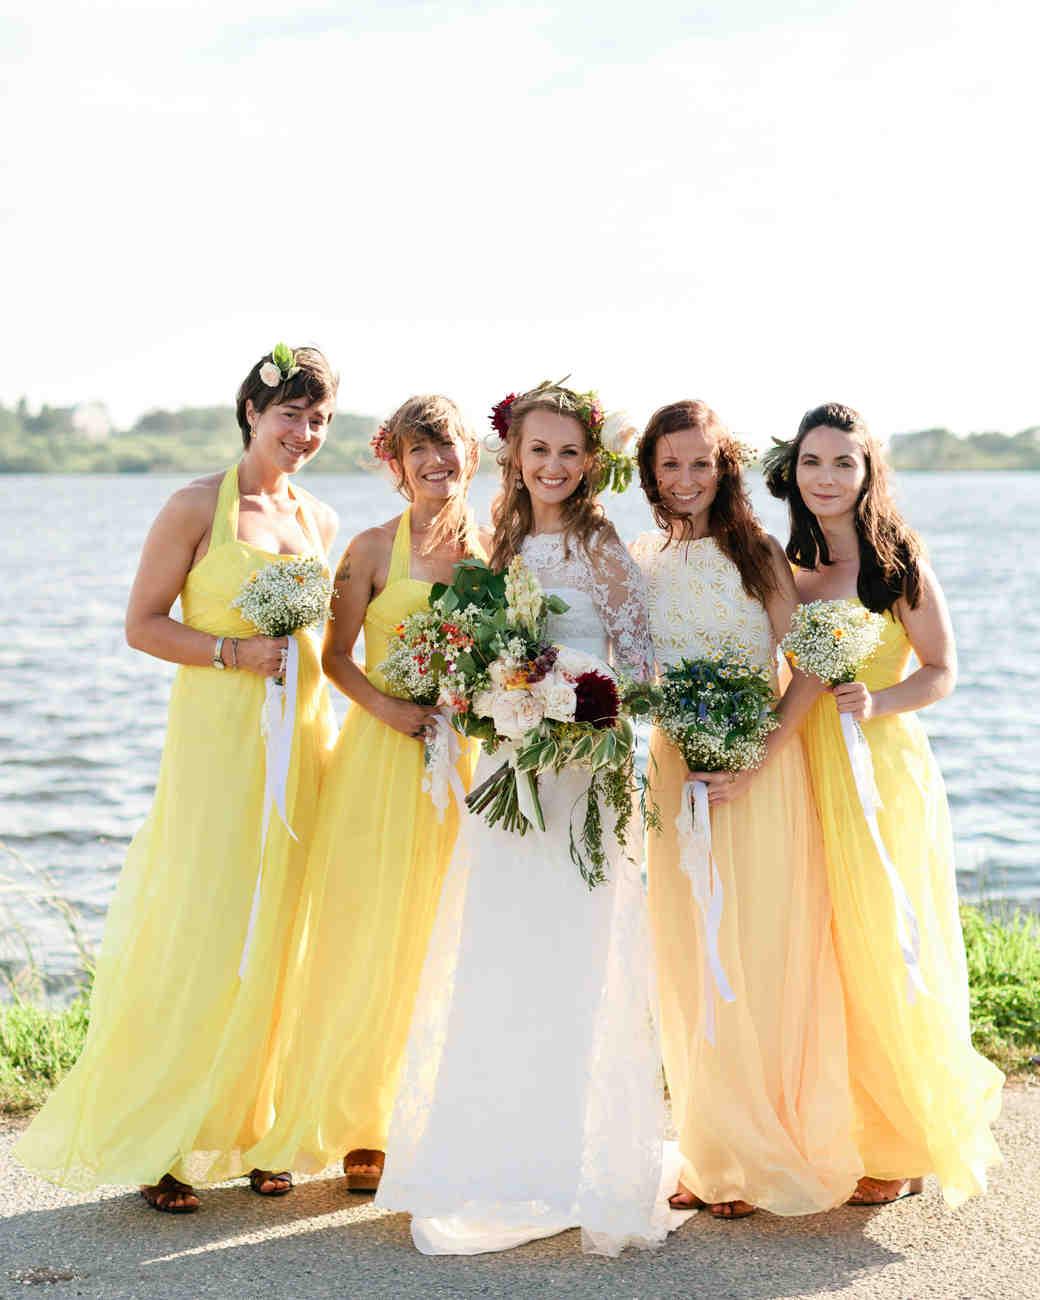 jola-tom-wedding-bridesmaids-0614.jpg